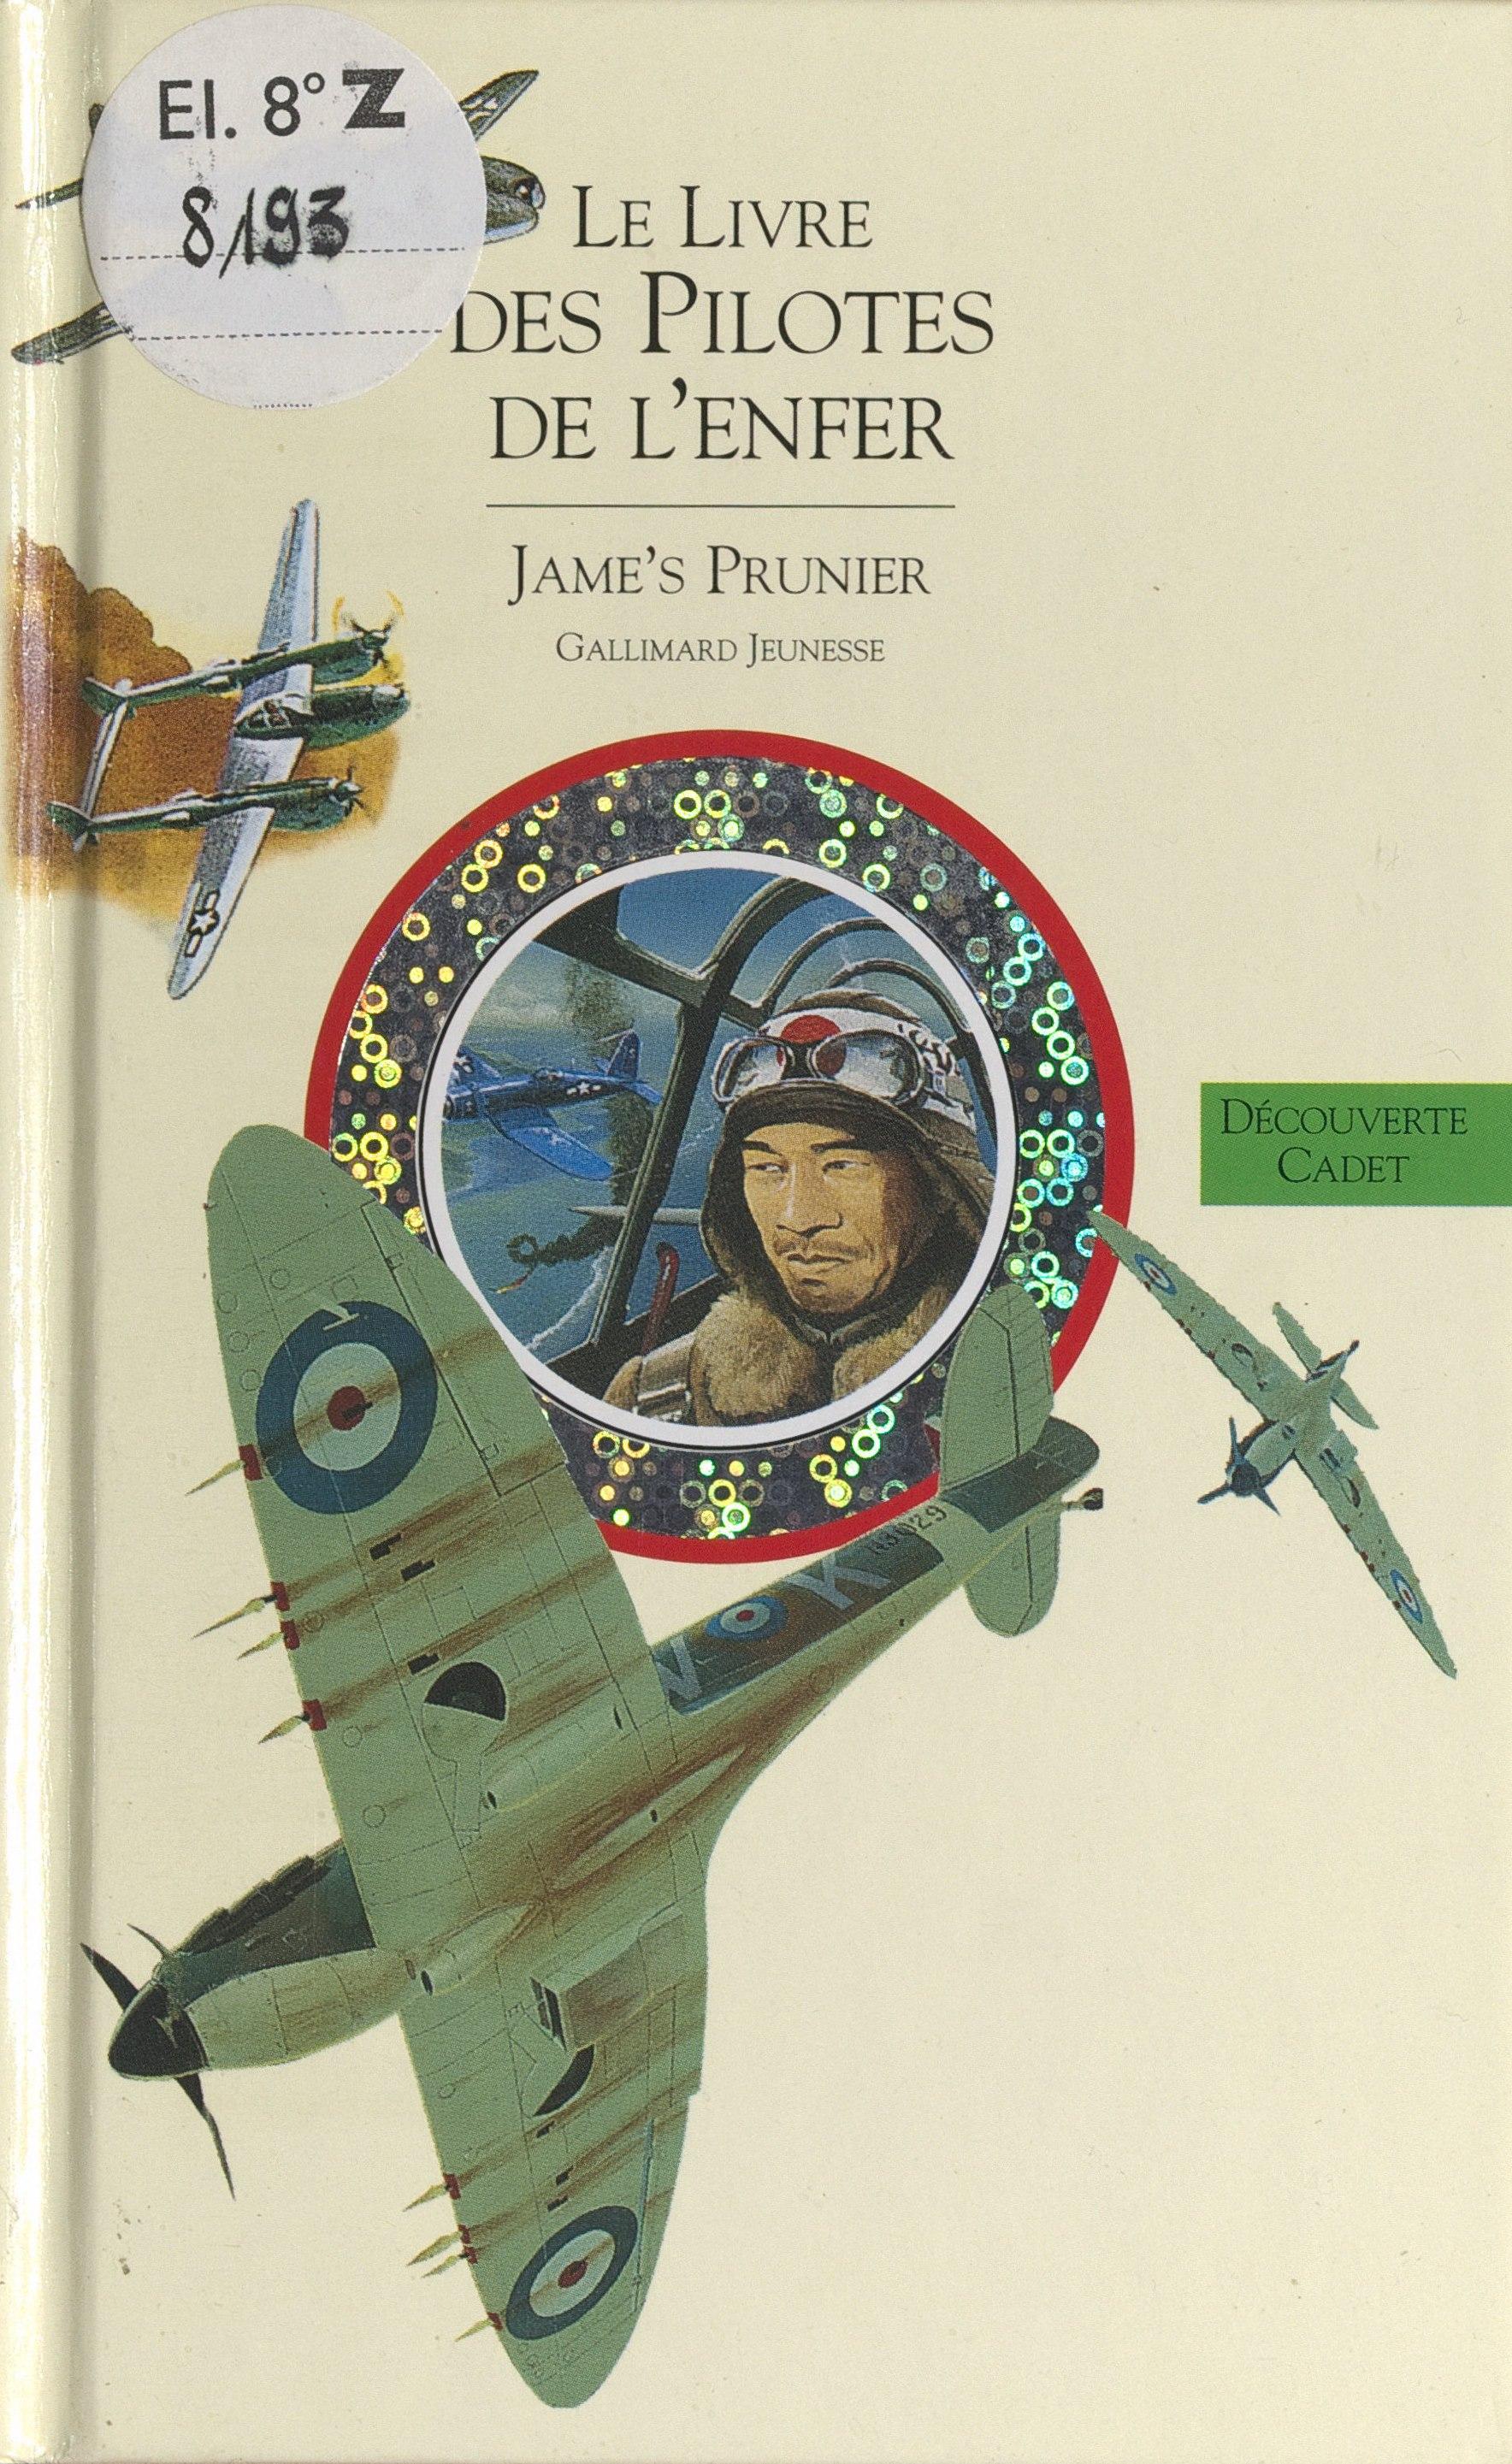 Histoire de l'aviation (3)